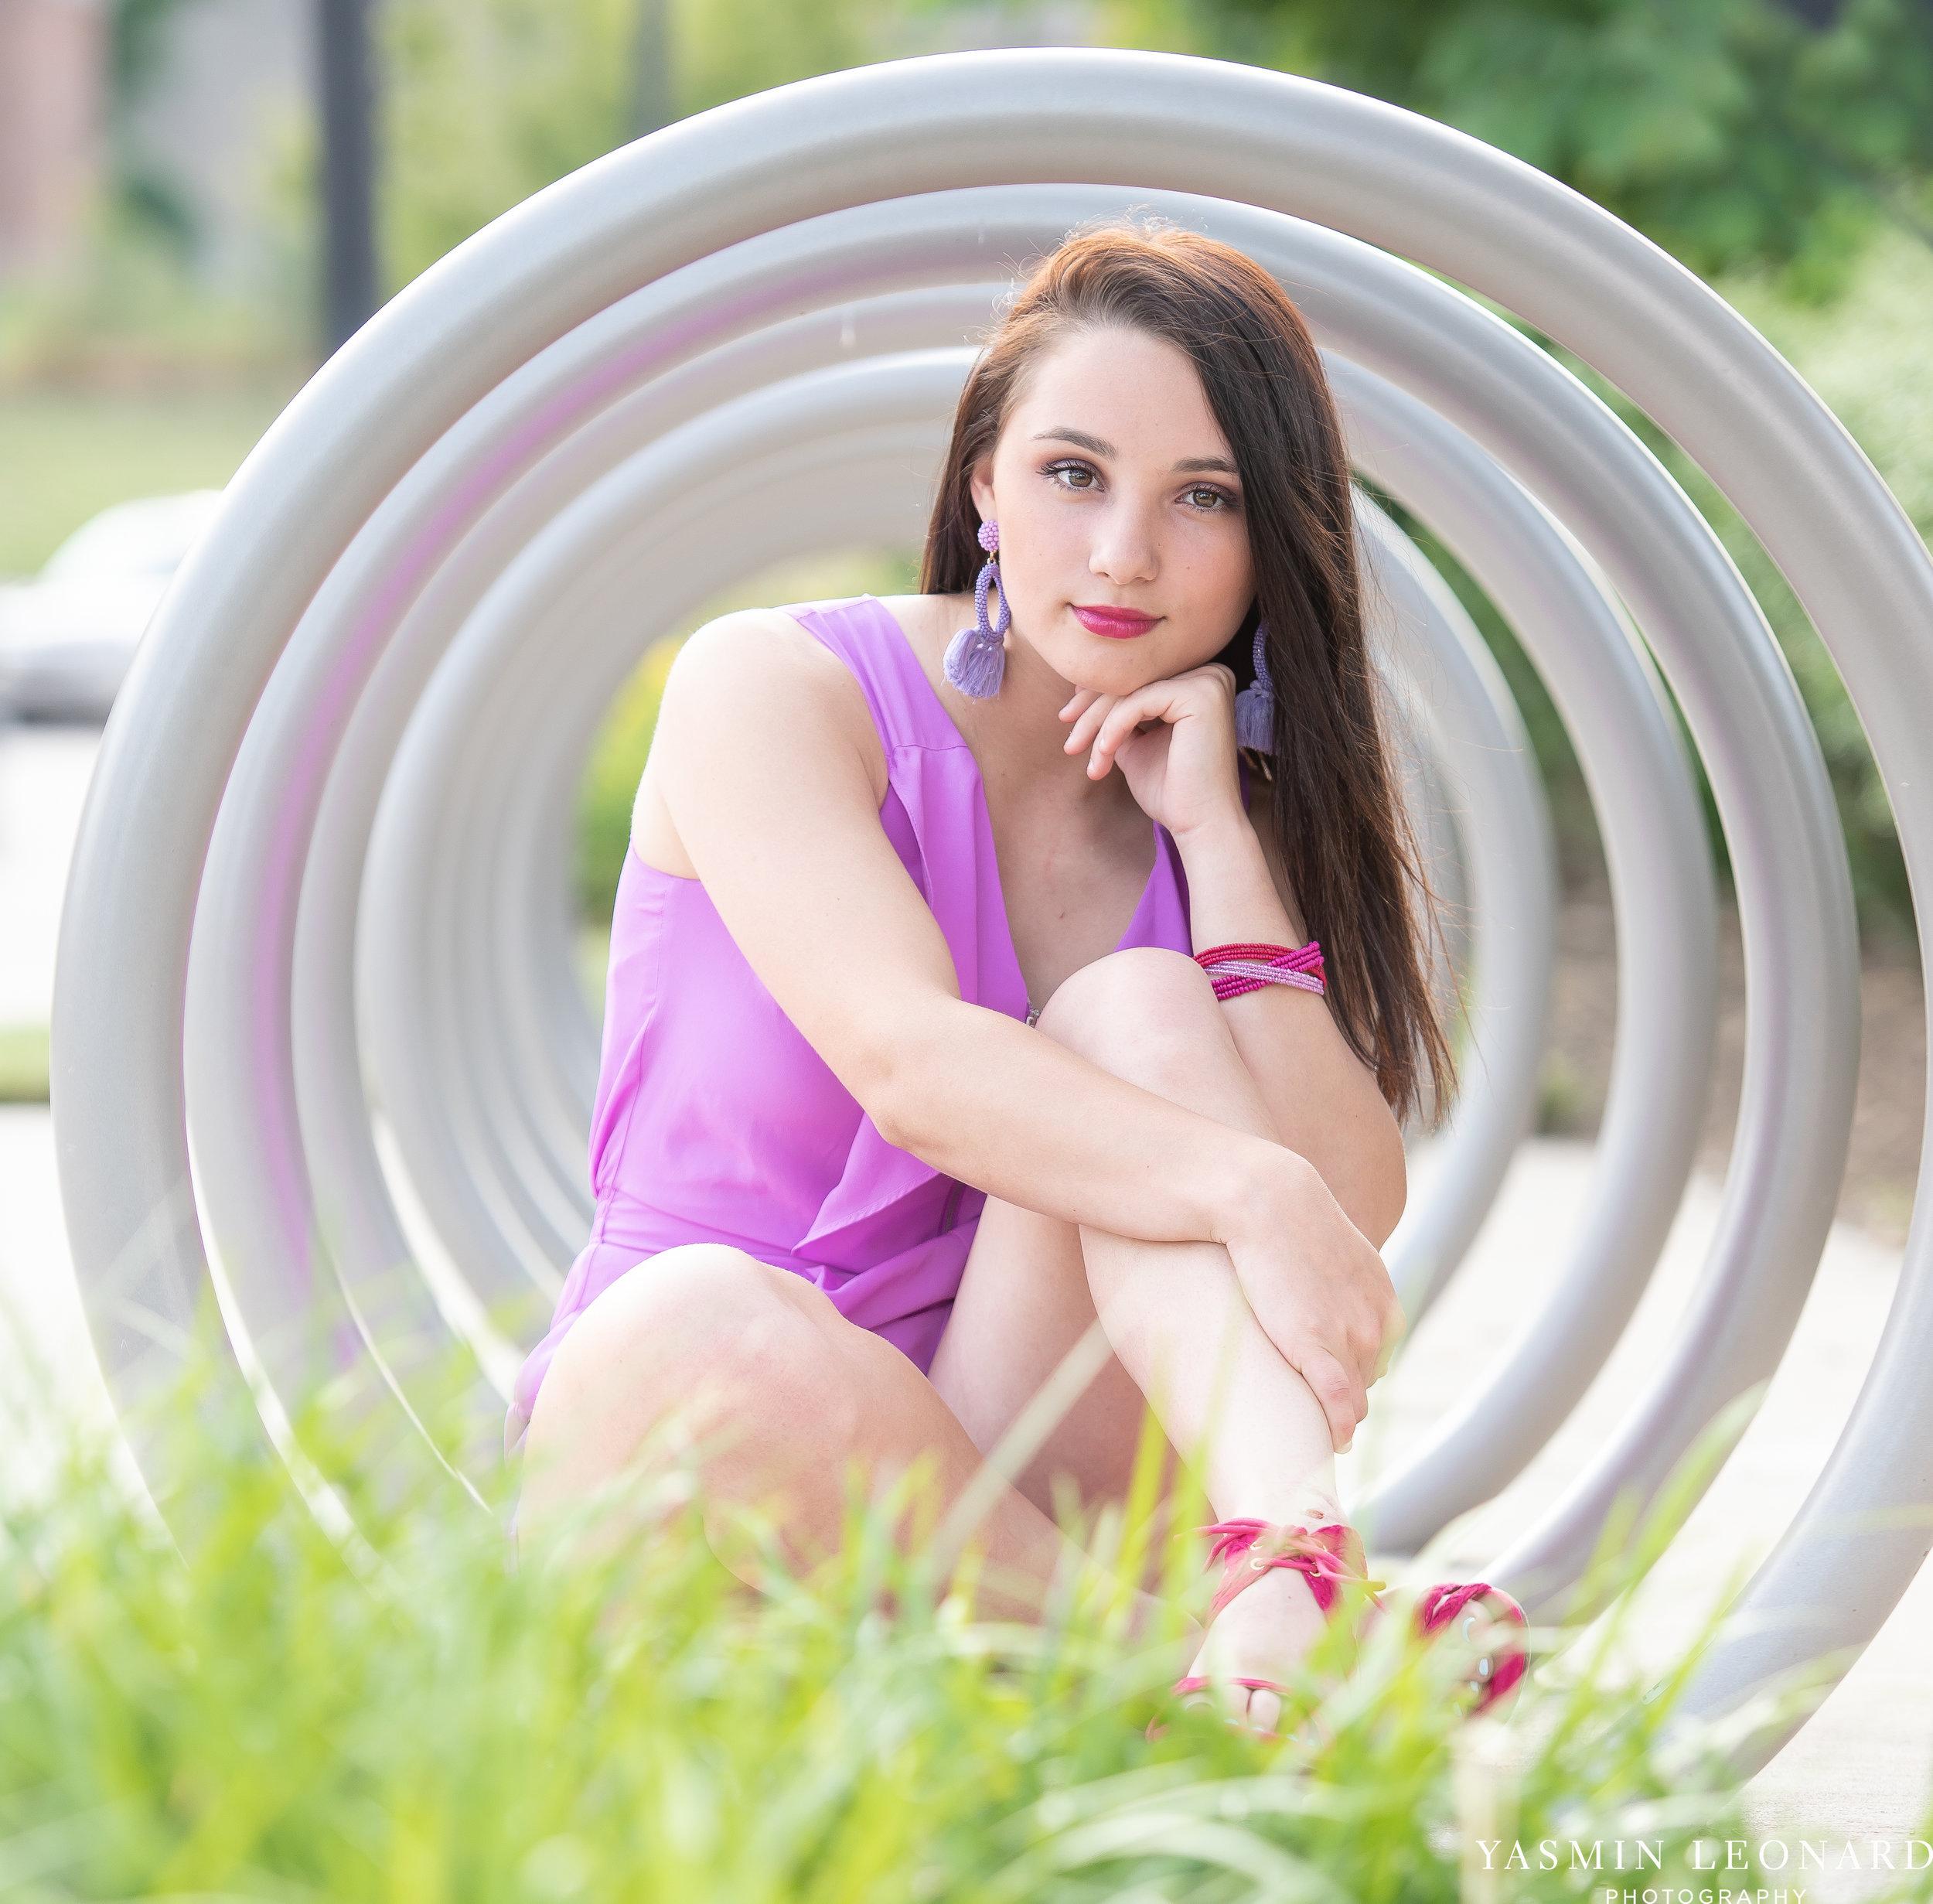 Senior Model Team Photos - Yasmin Leonard Photography-6.jpg